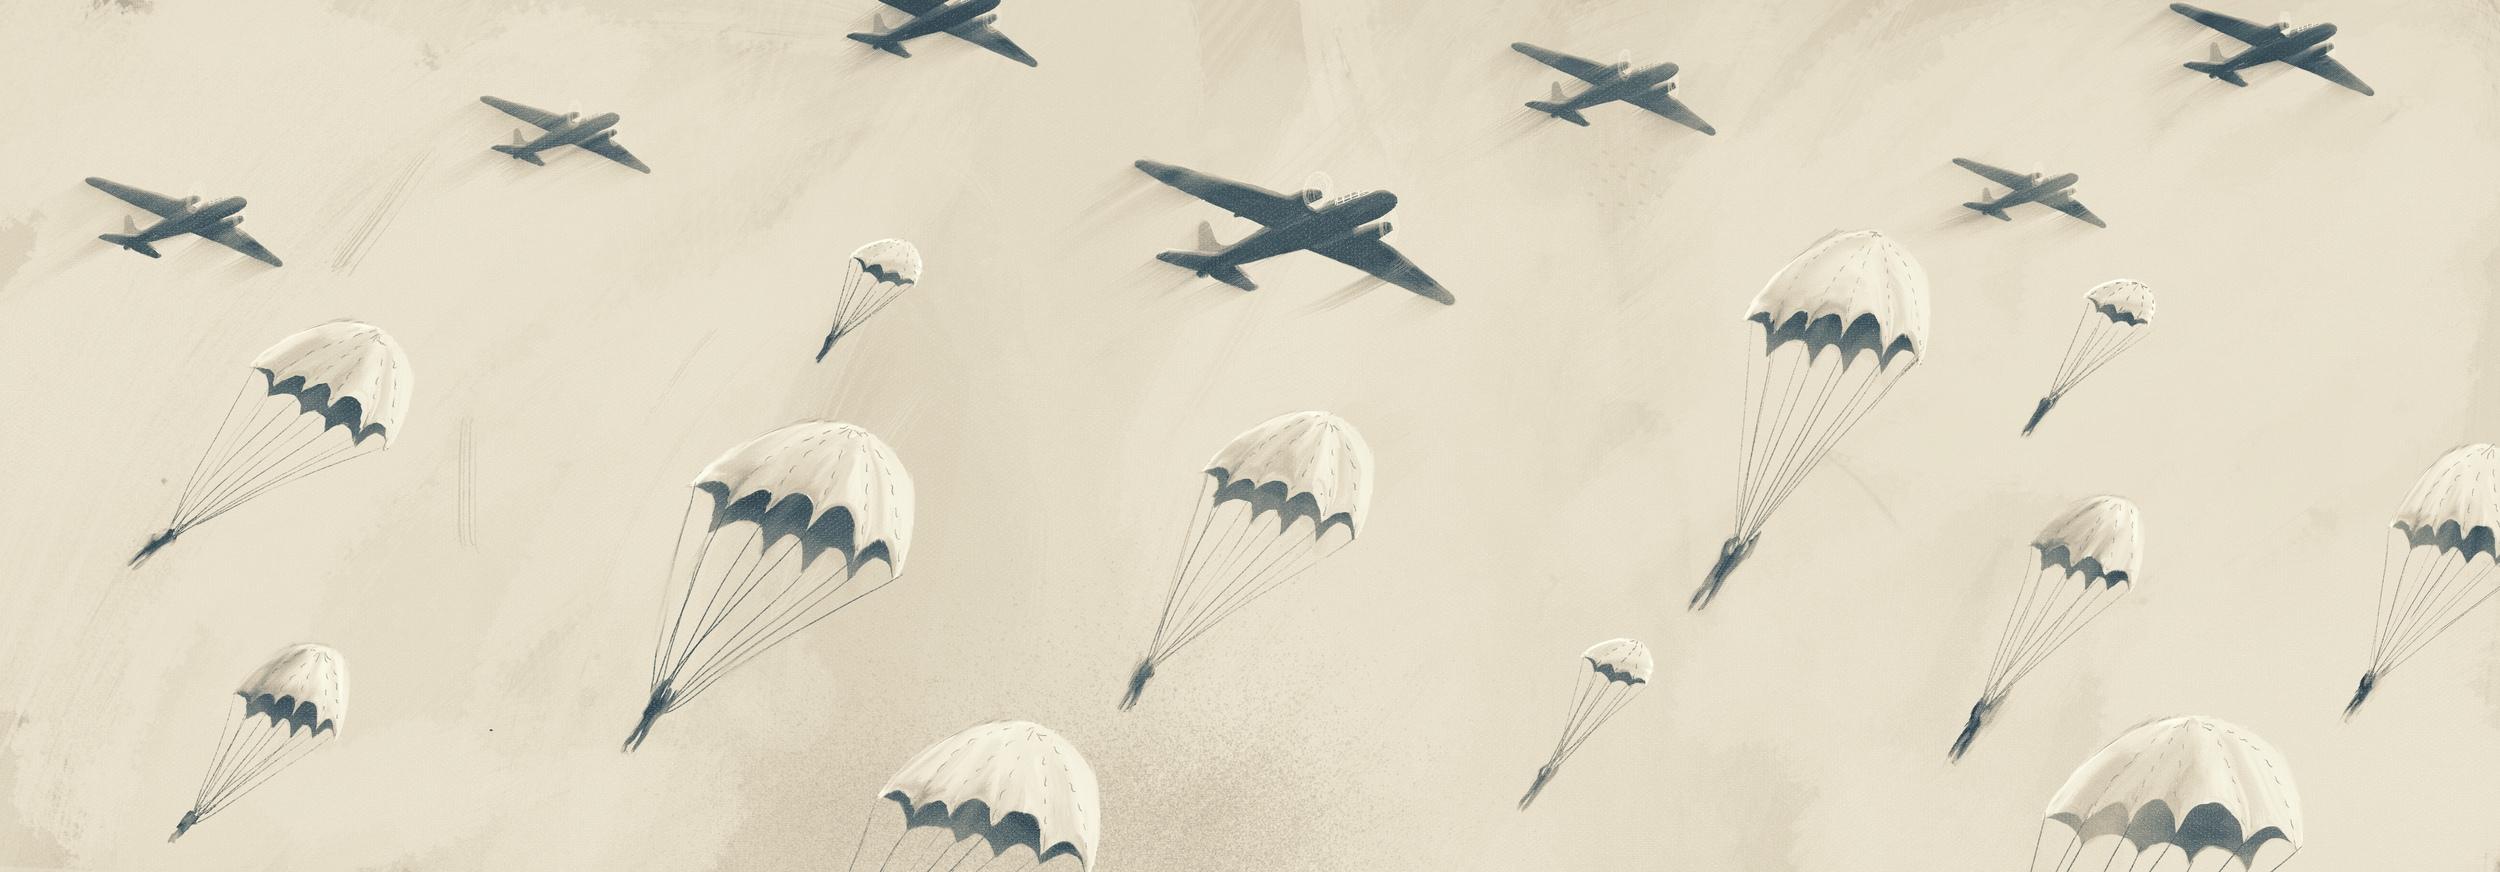 05_Parachutes.jpg